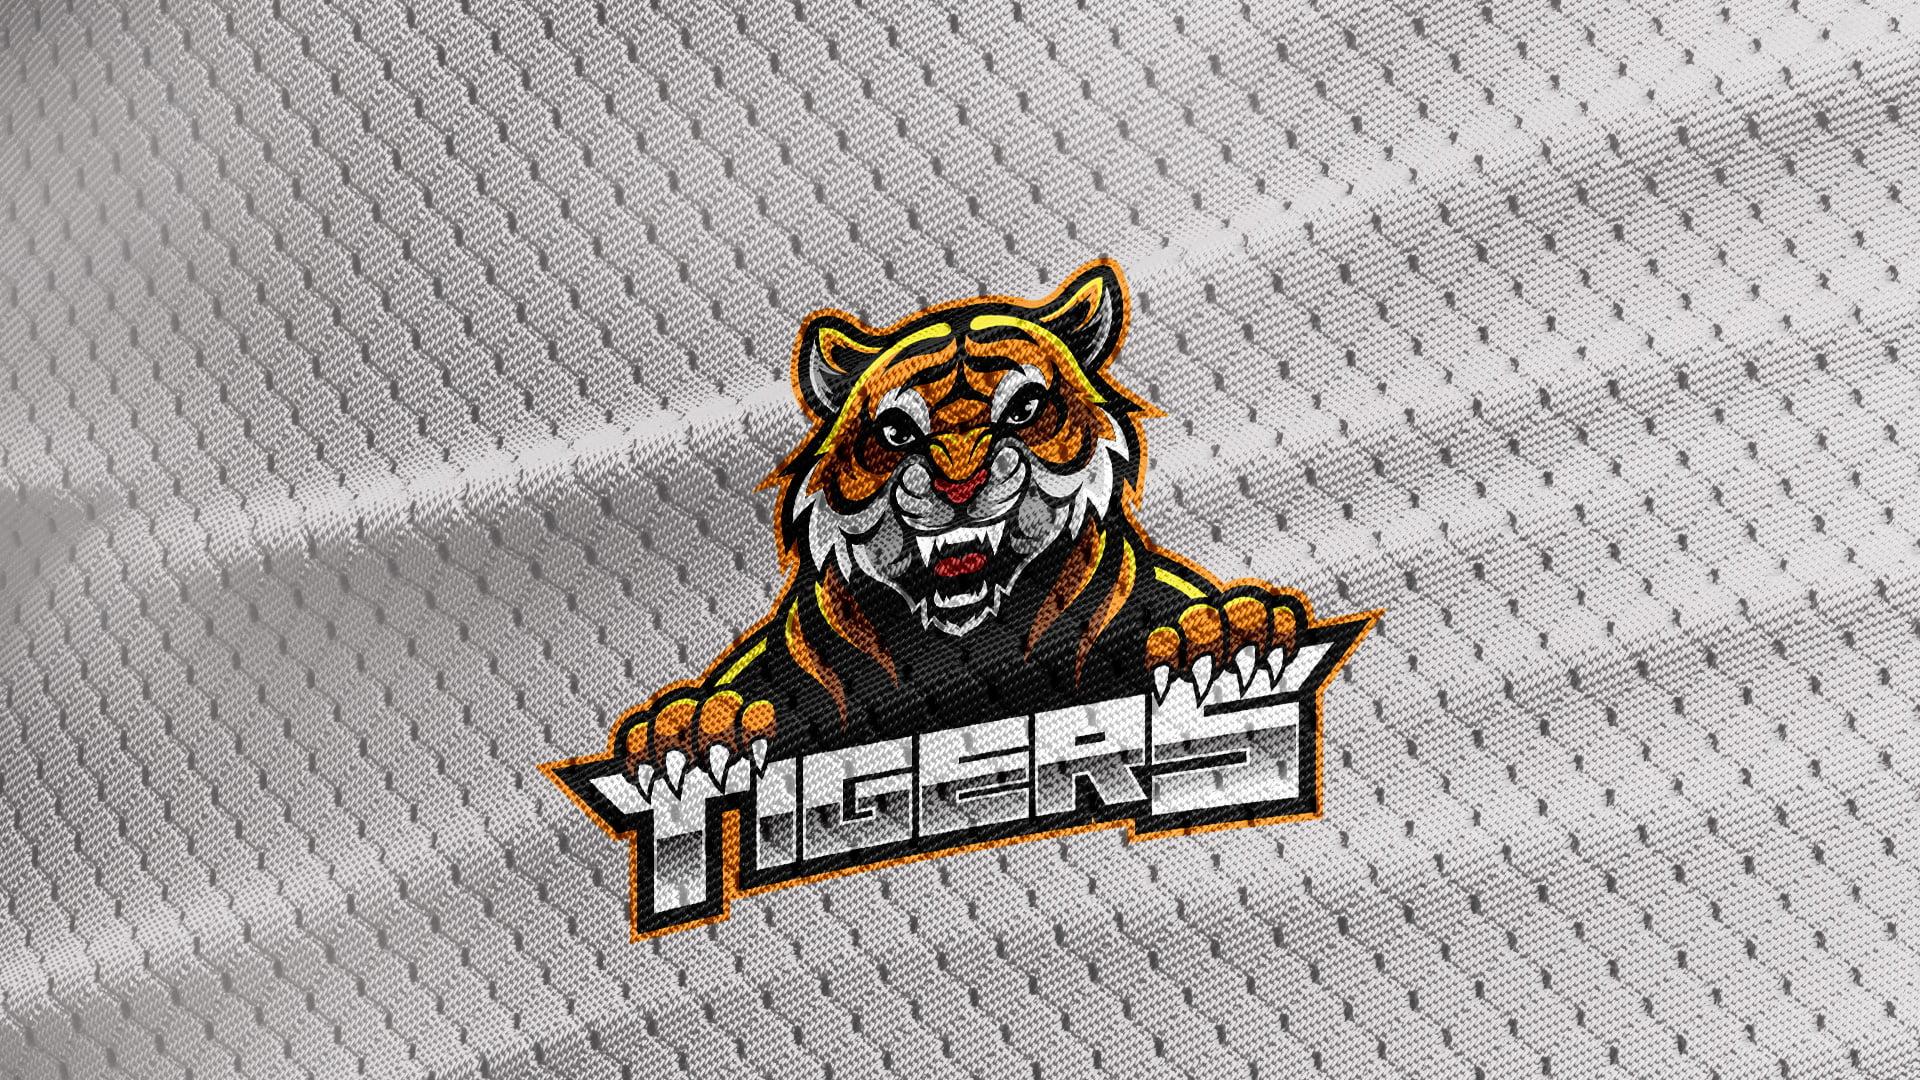 Gray-Jersey-Texture-Free-Download-Tiger-Logo-Mascot